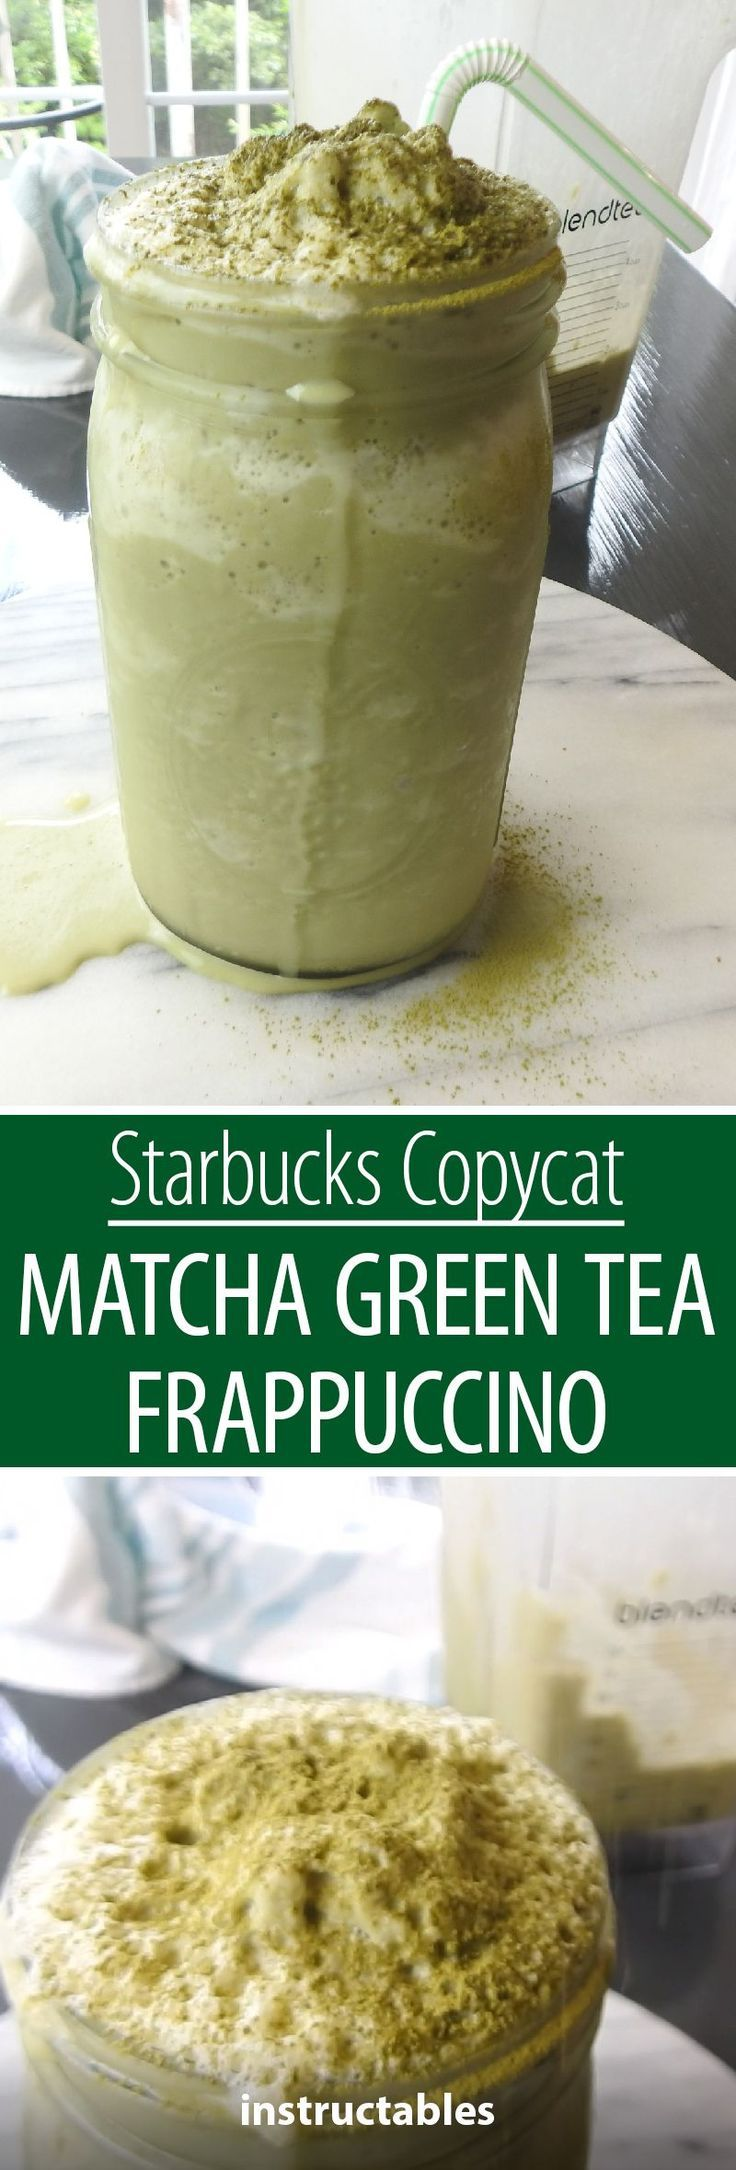 Photo of Starbucks Copycat Matcha Green Tea Frappuccino